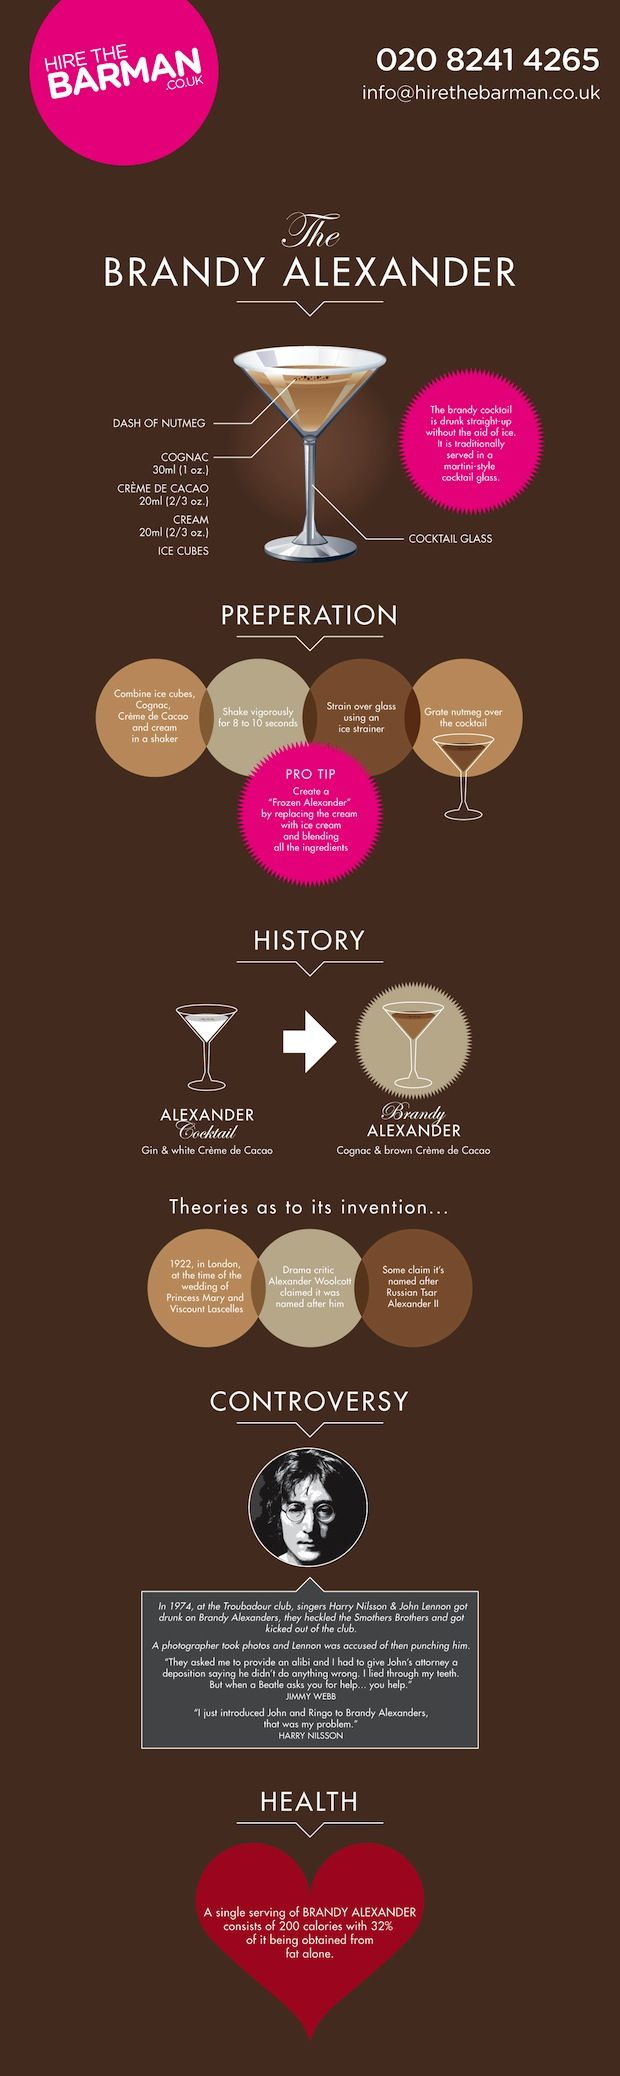 Brandy Alexander   Recipes - Drinks   Pinterest